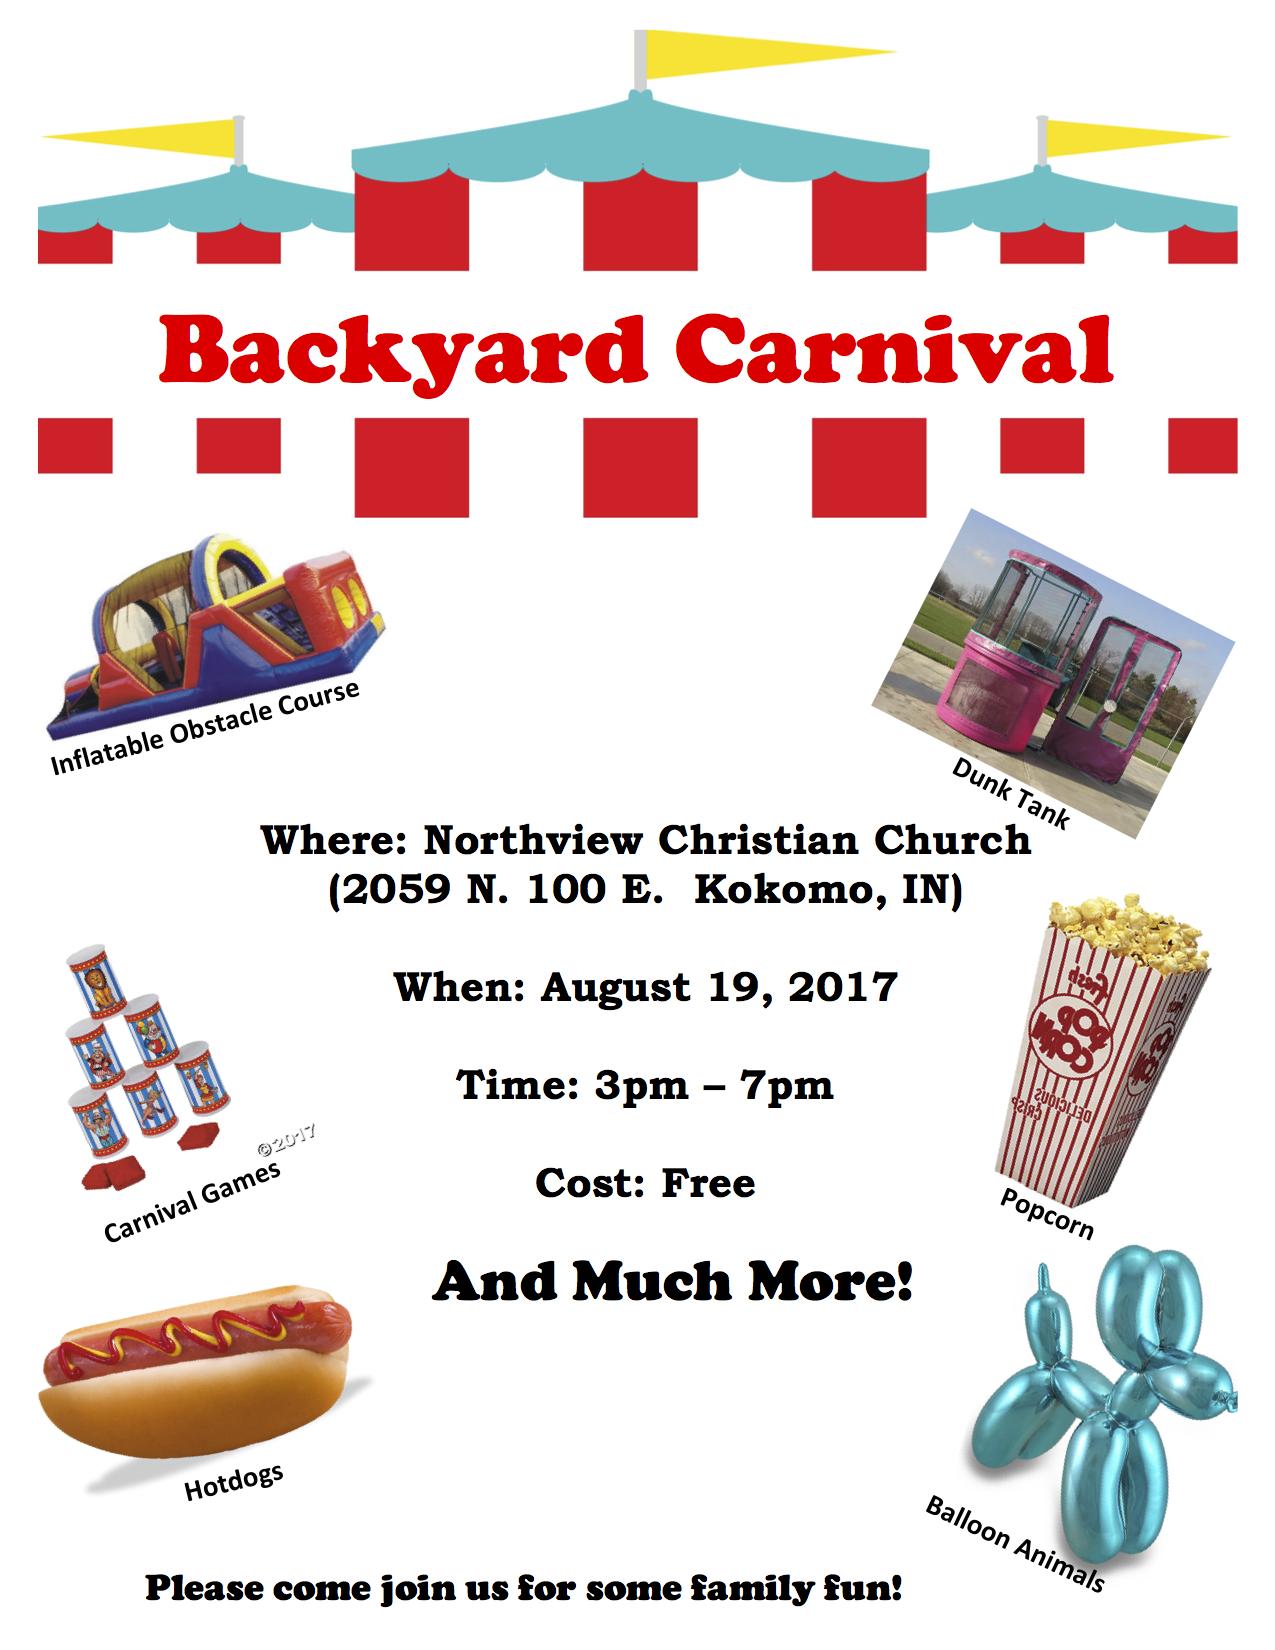 Backyard Carnival backyard carnival   z 92.5